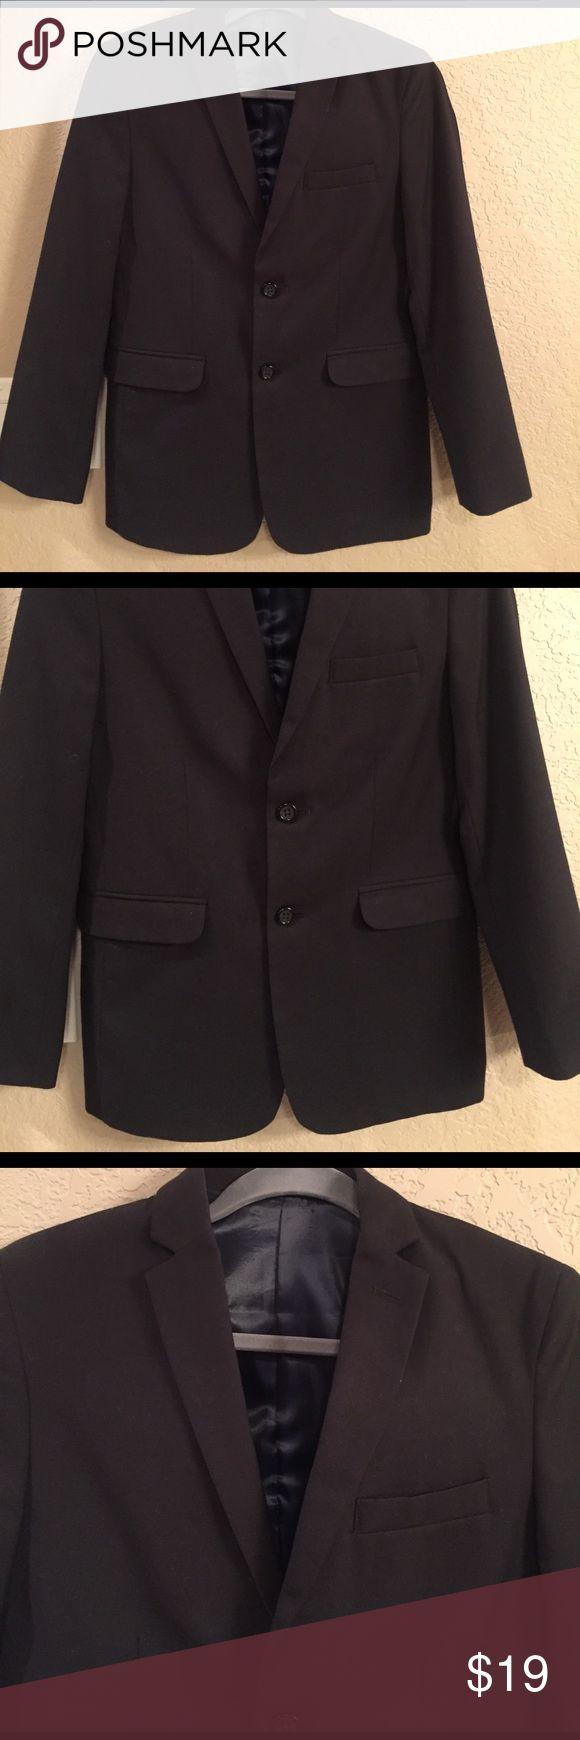 IZOD Boys Black Suit Jacket Perfect condition Boys Suit Jacket worn once to Church Izod Jackets & Coats Blazers